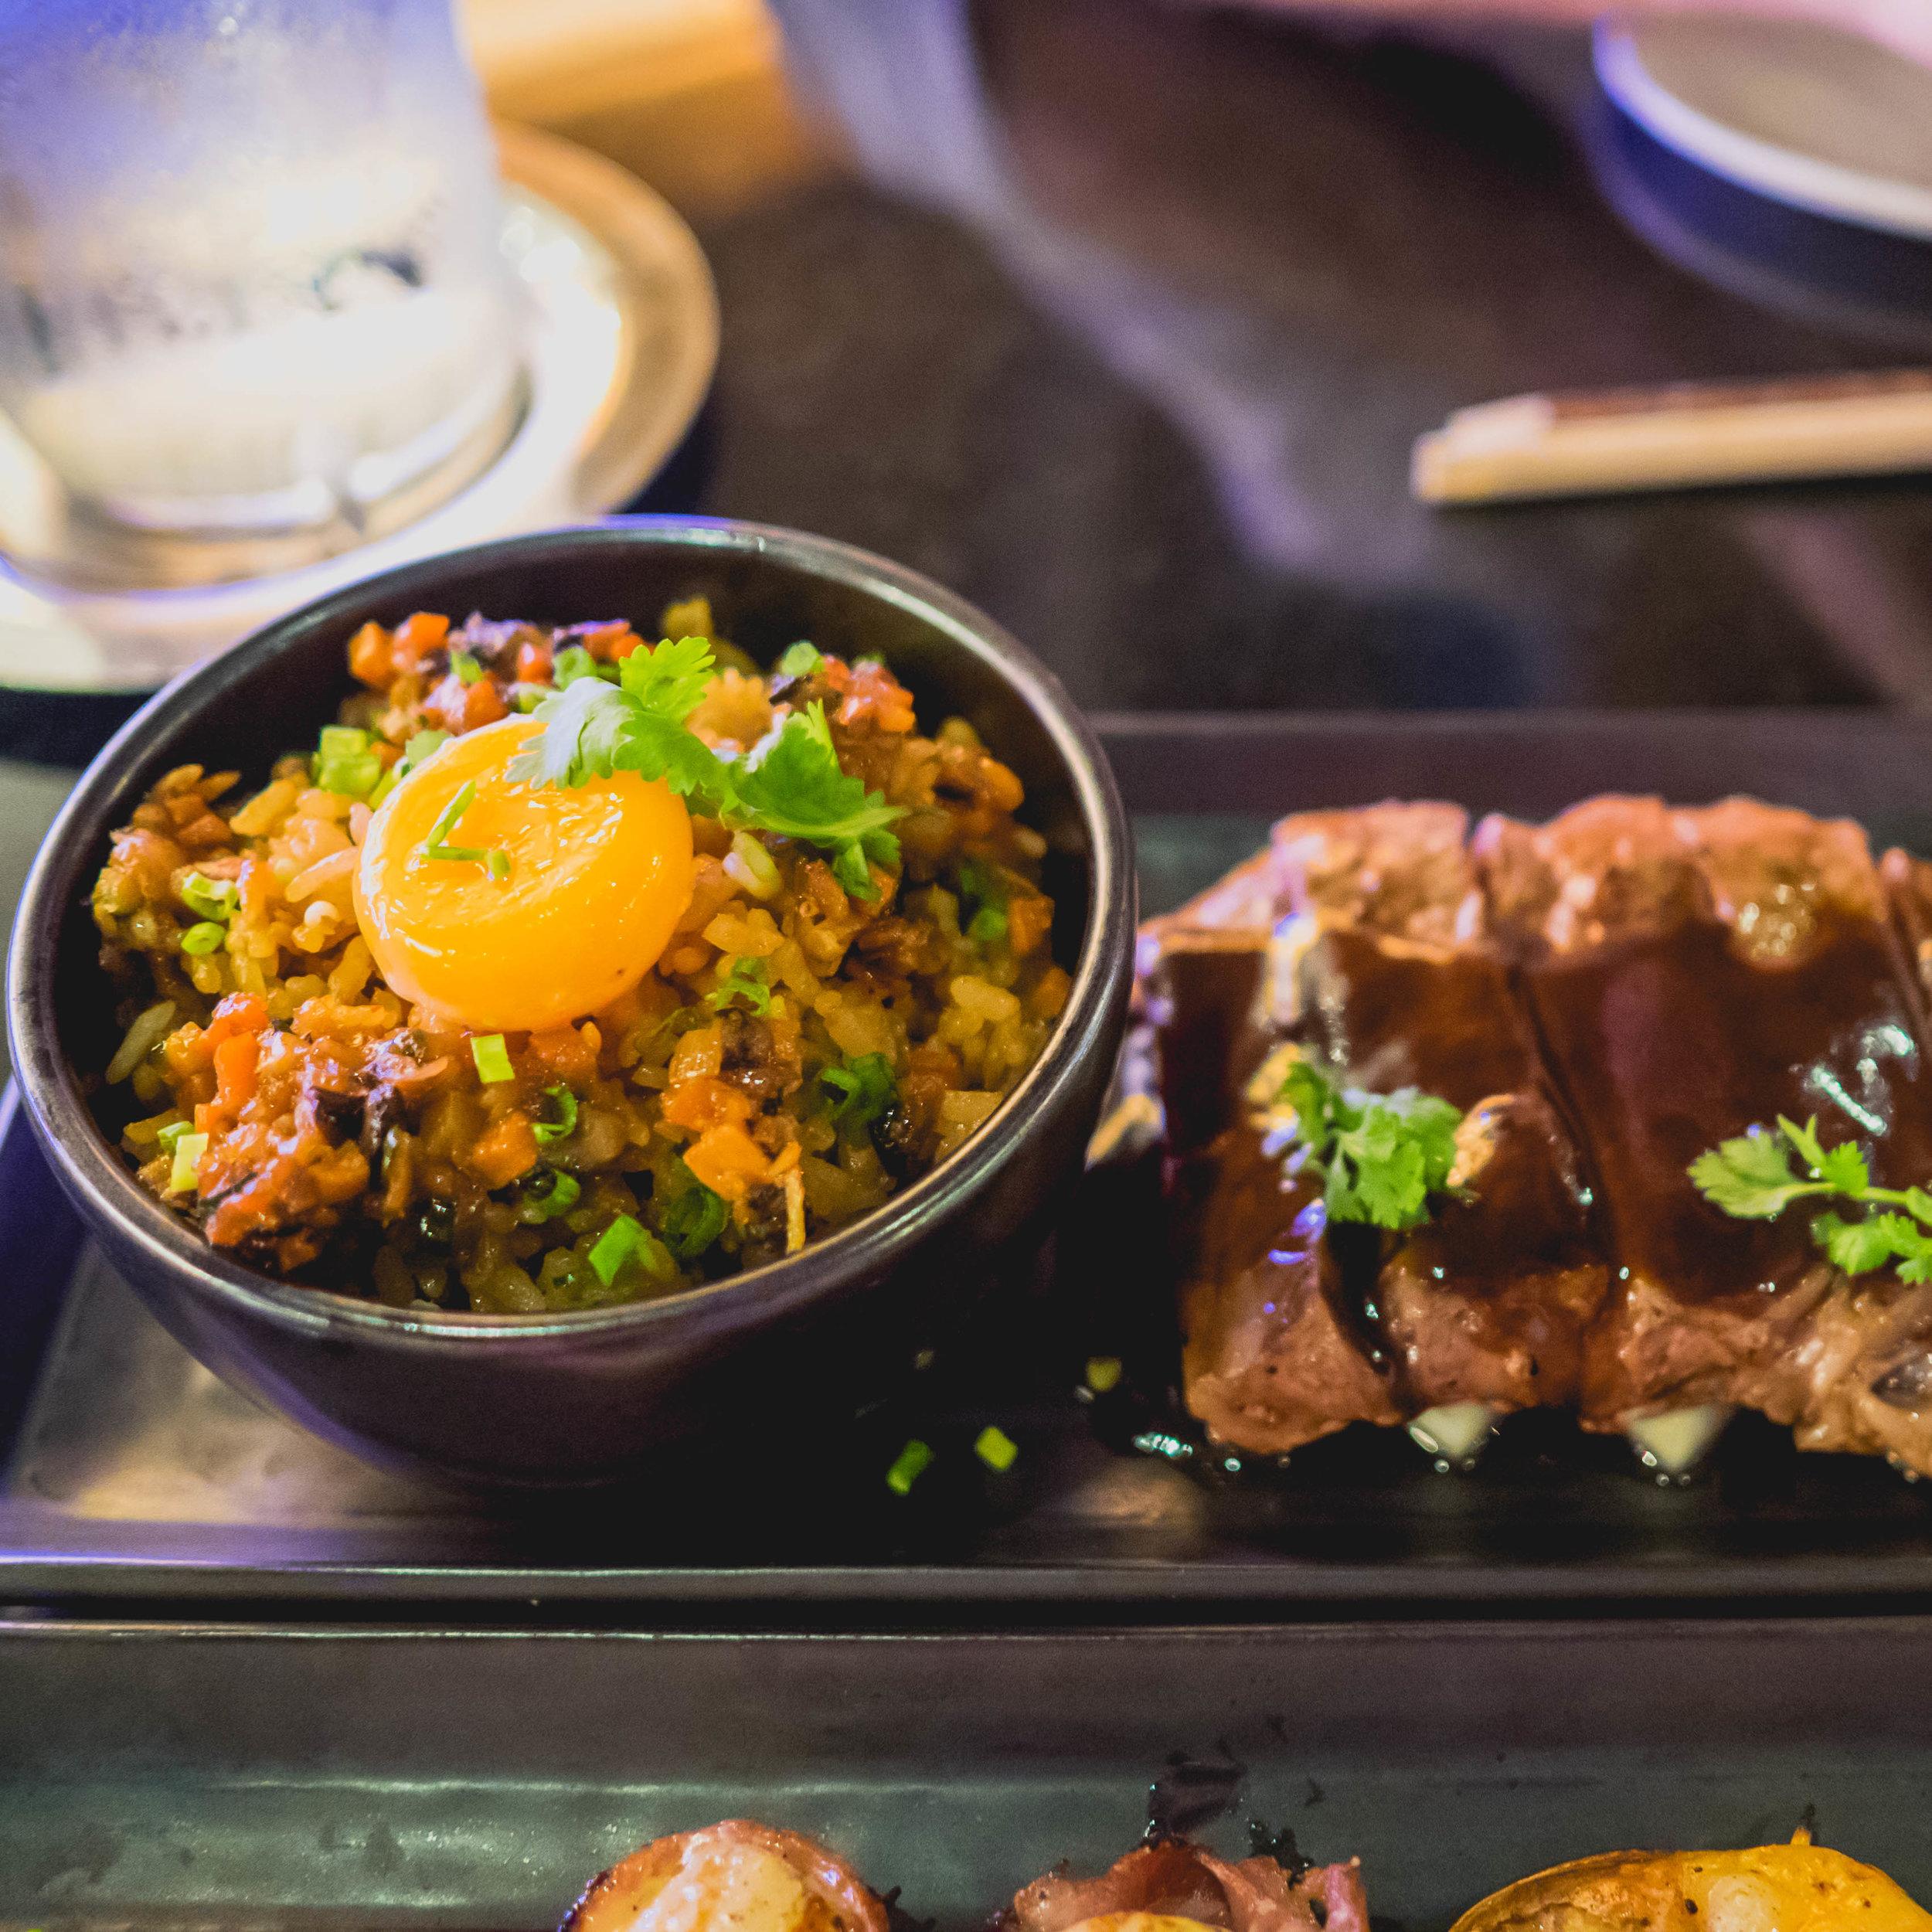 korean fried rice and wagyu beef soy caramel  at umami.